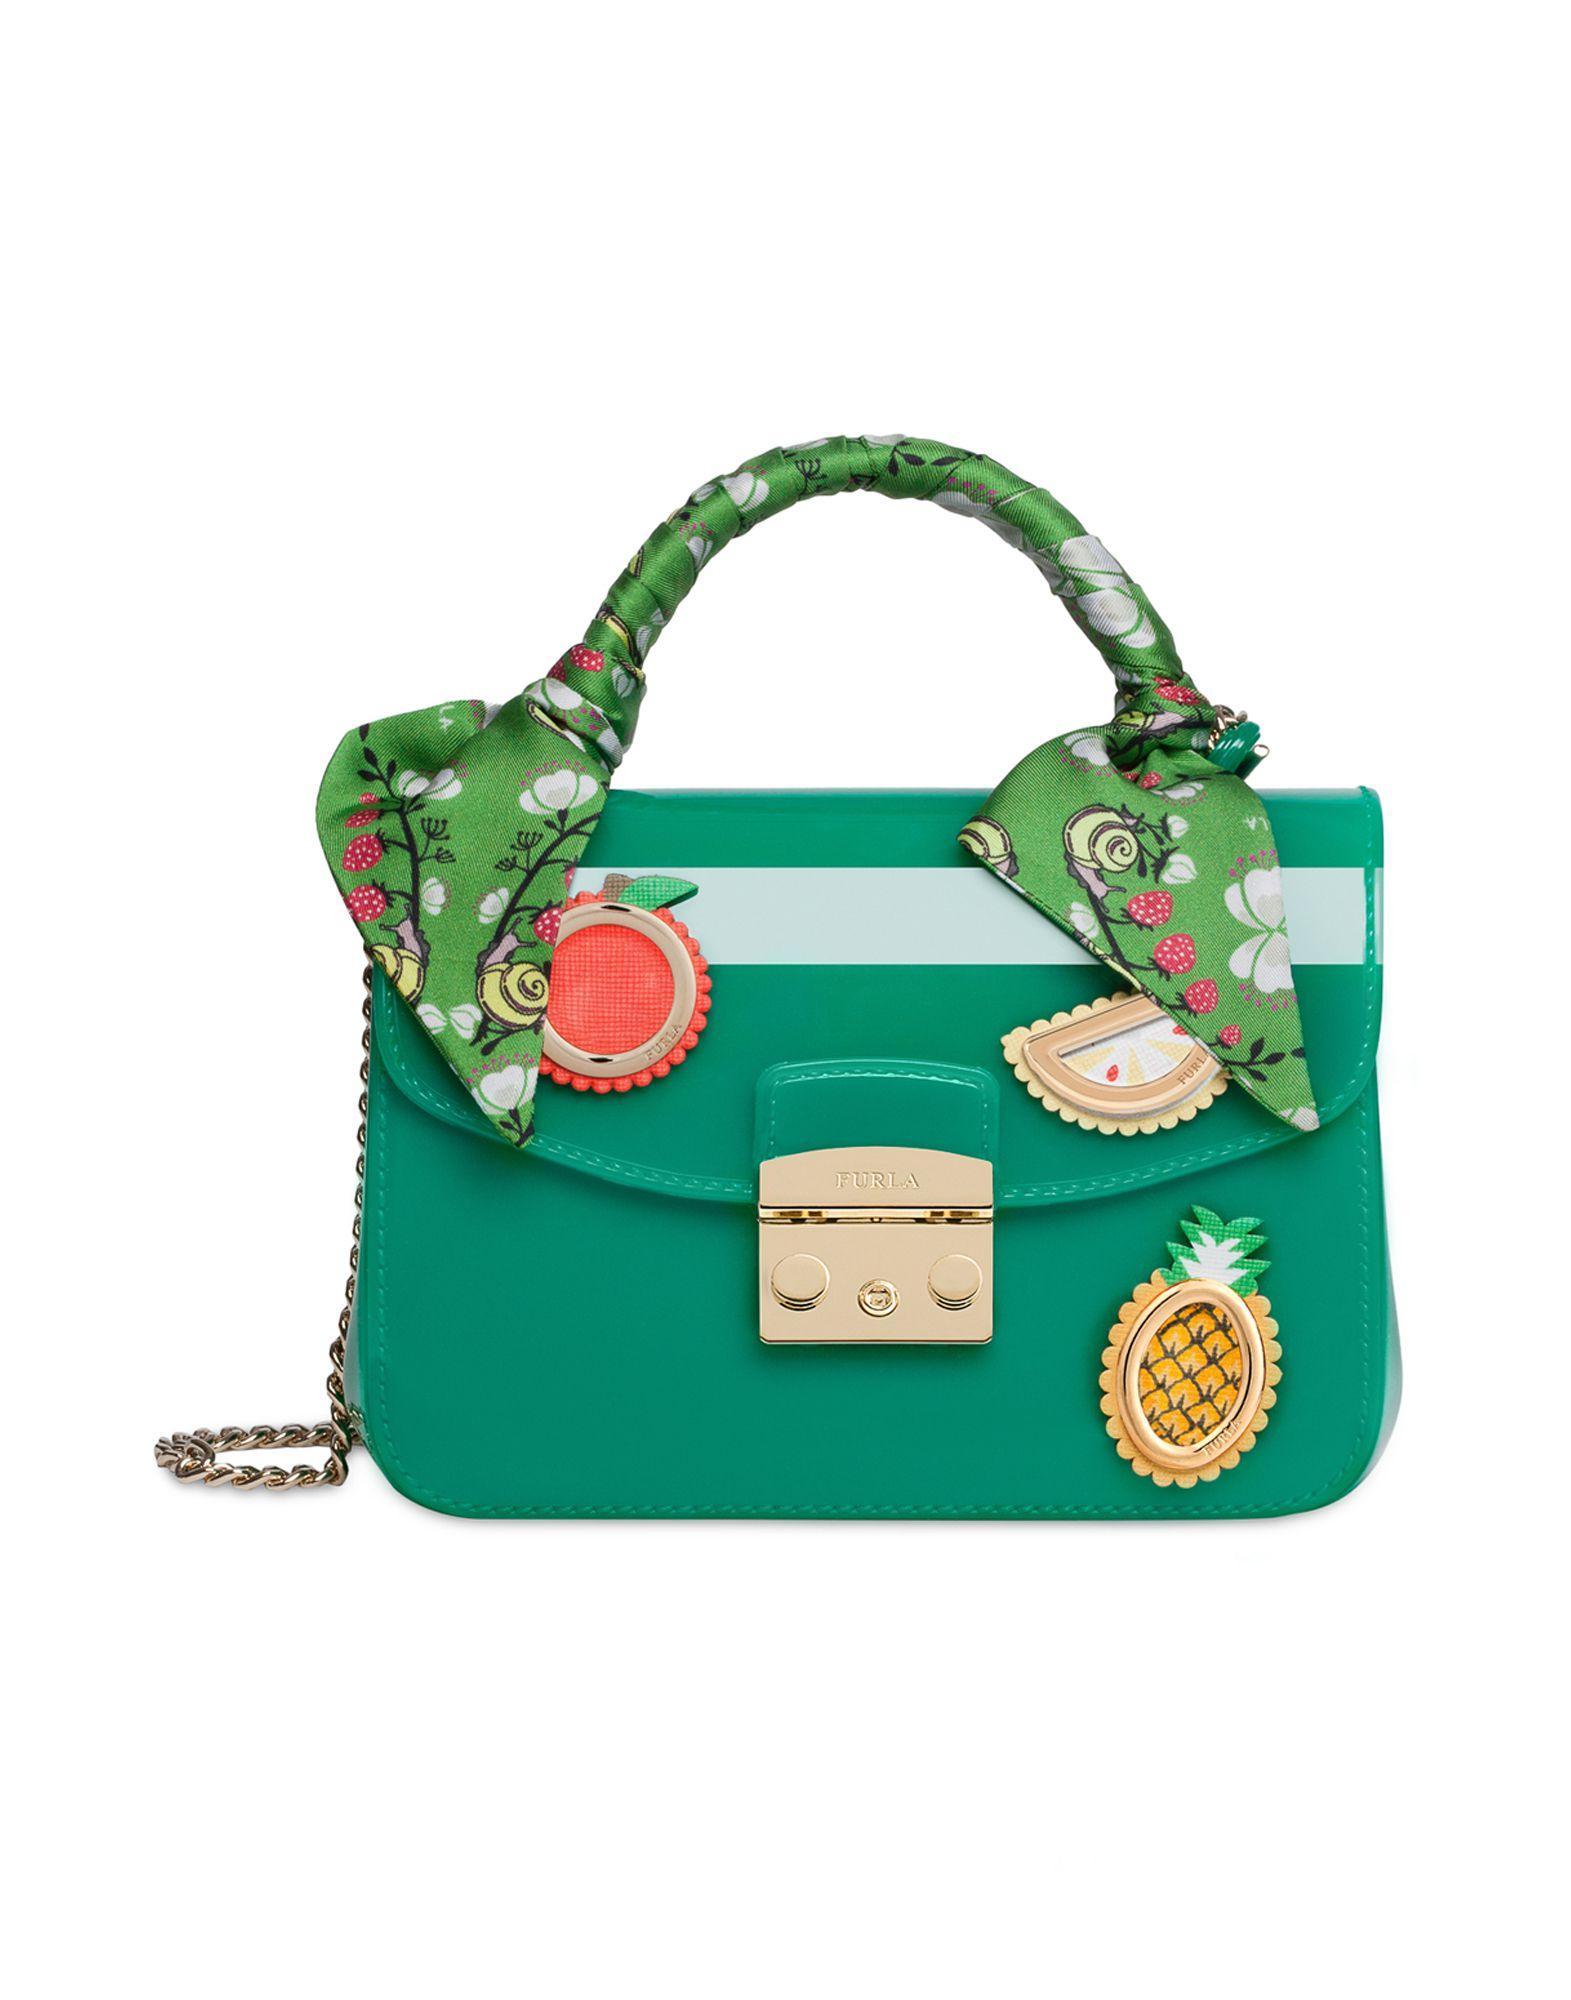 Furla In Emerald Green